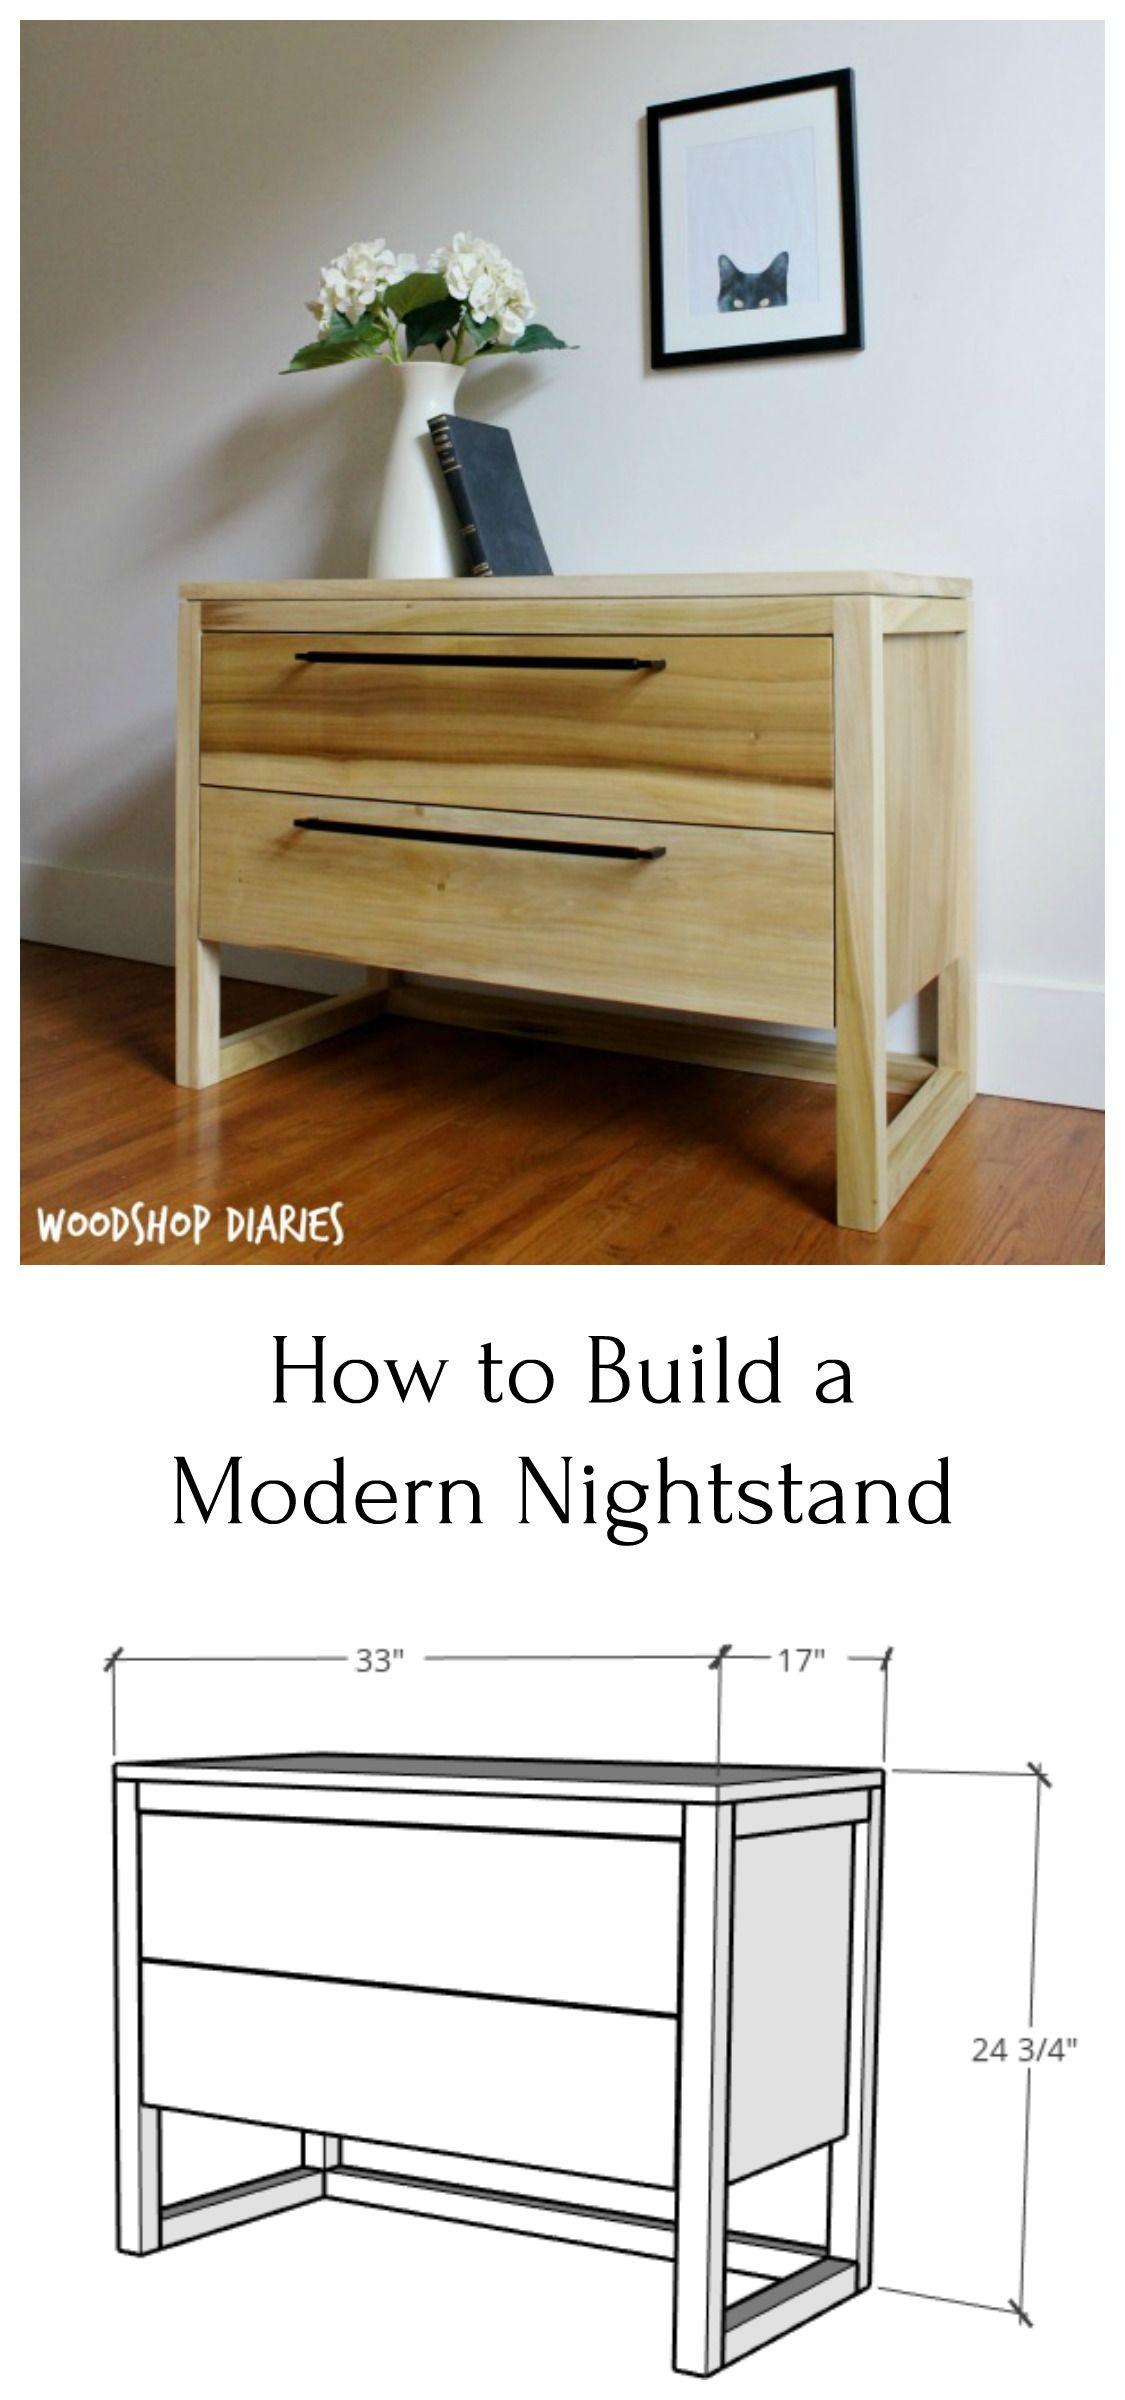 DIY Modern Nightstand {How to Build it in 6 Easy Steps